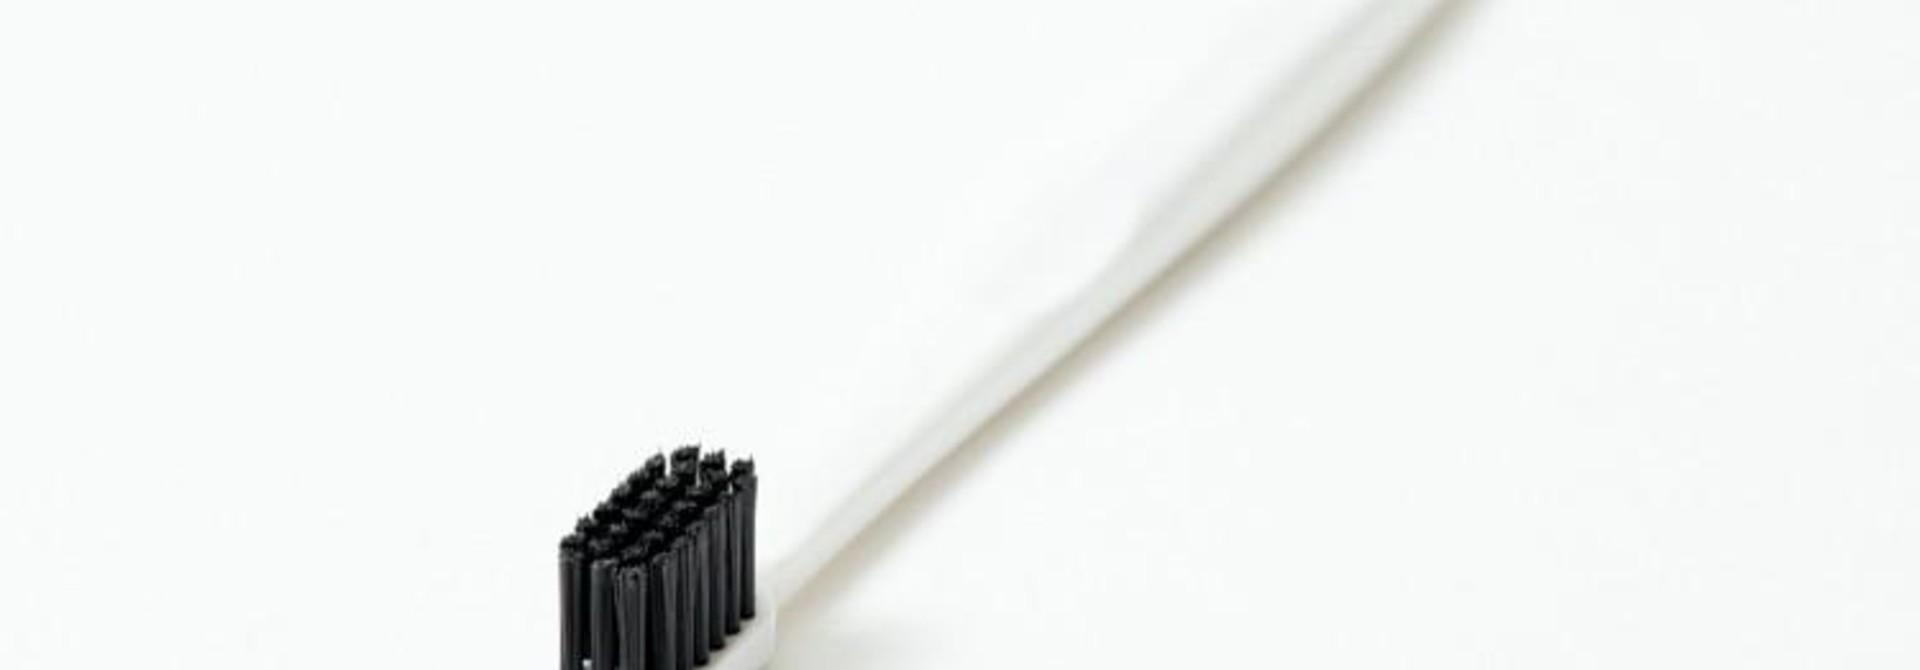 Binchotan Charcoal Toothbrush - Standard, White